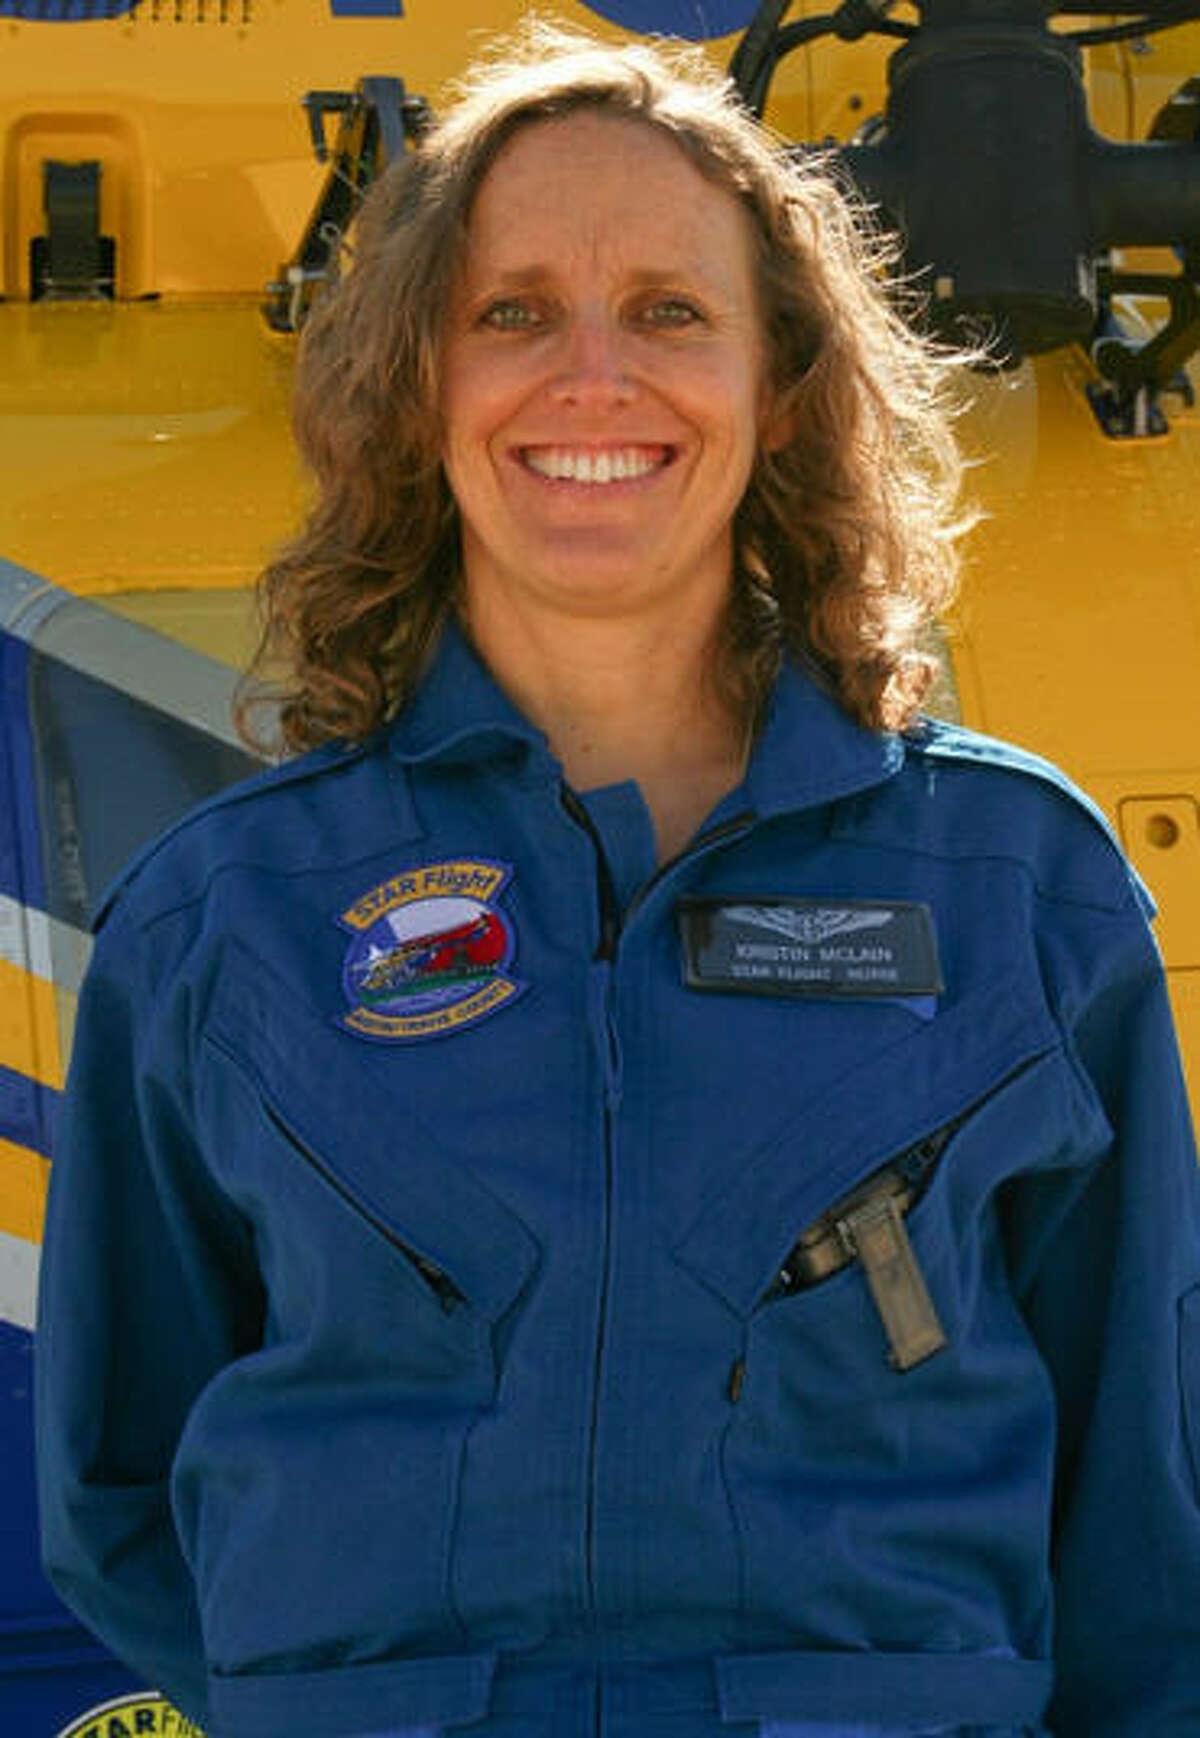 Kristin Mclain (STARflight Travis County)